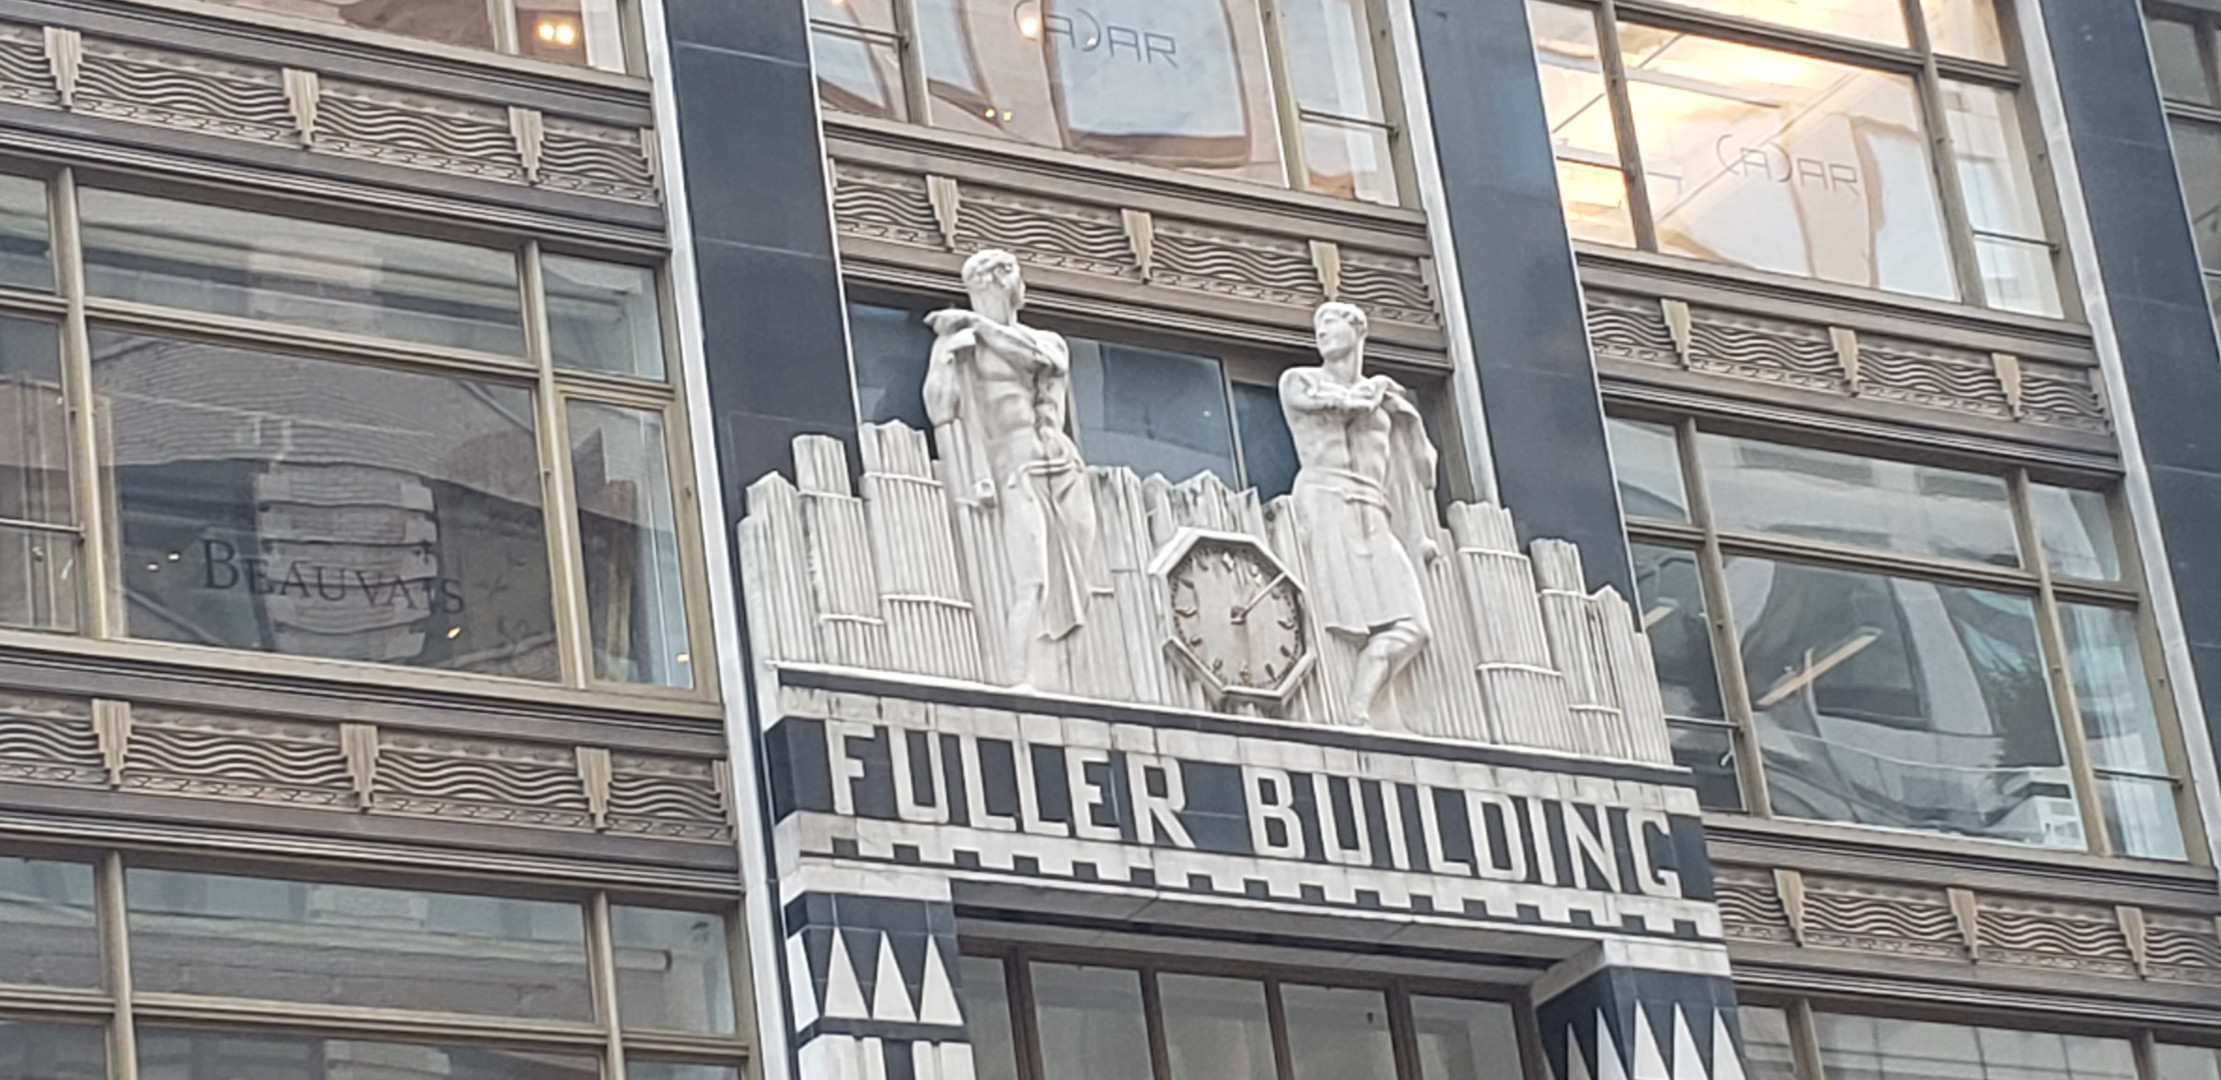 Fuller Building